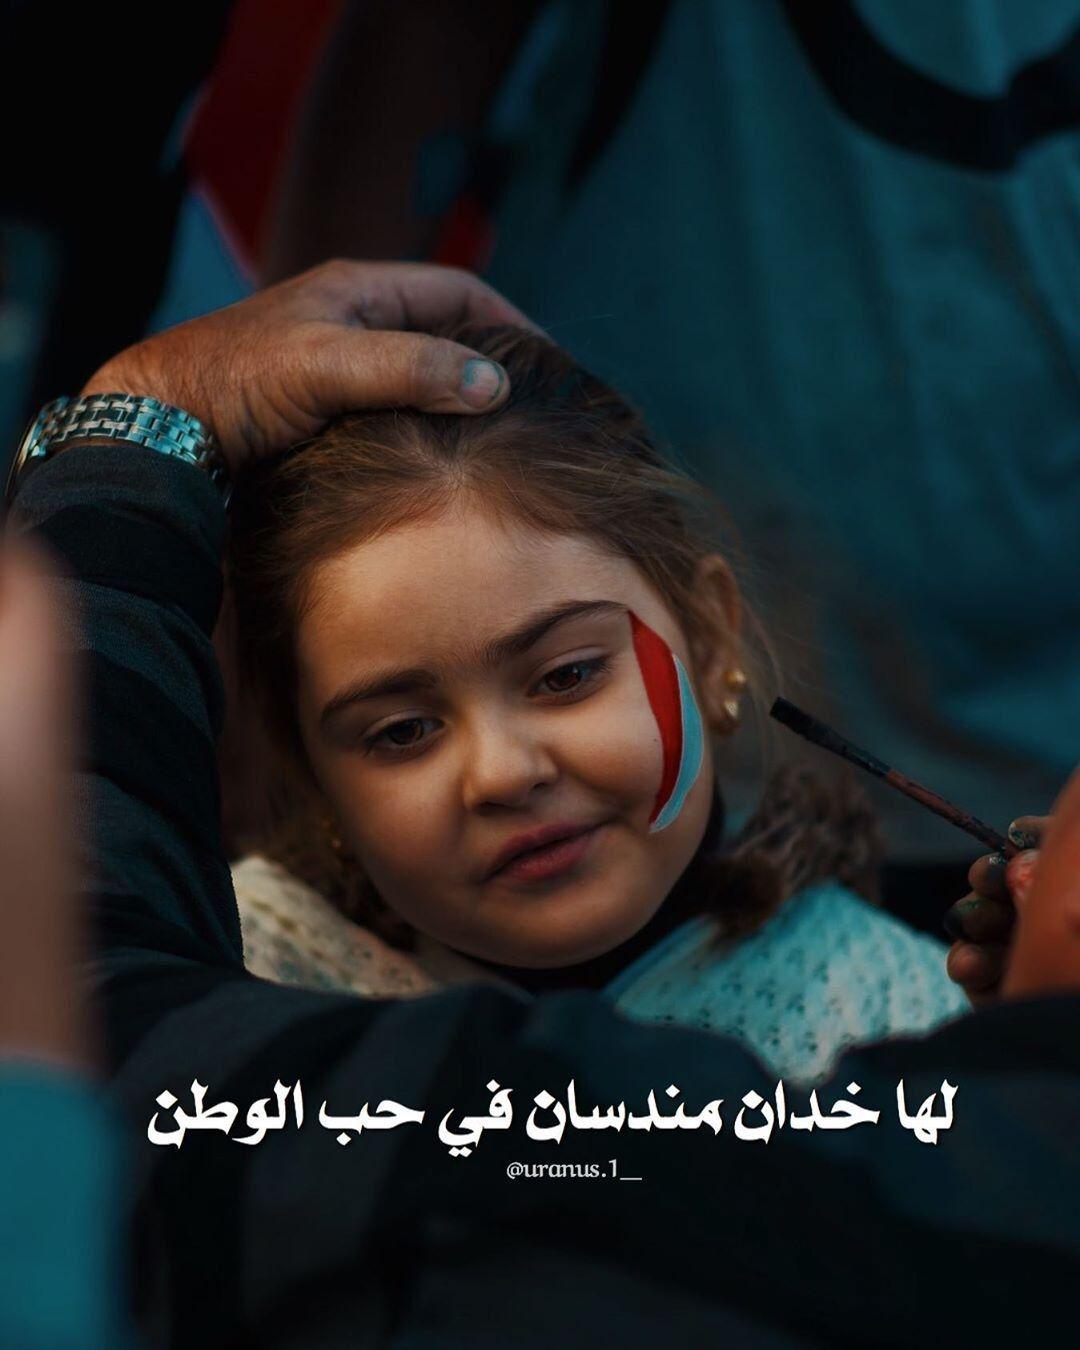 لها خدان مندسان في حب الوطن Iraqi People Uranus Photo And Video